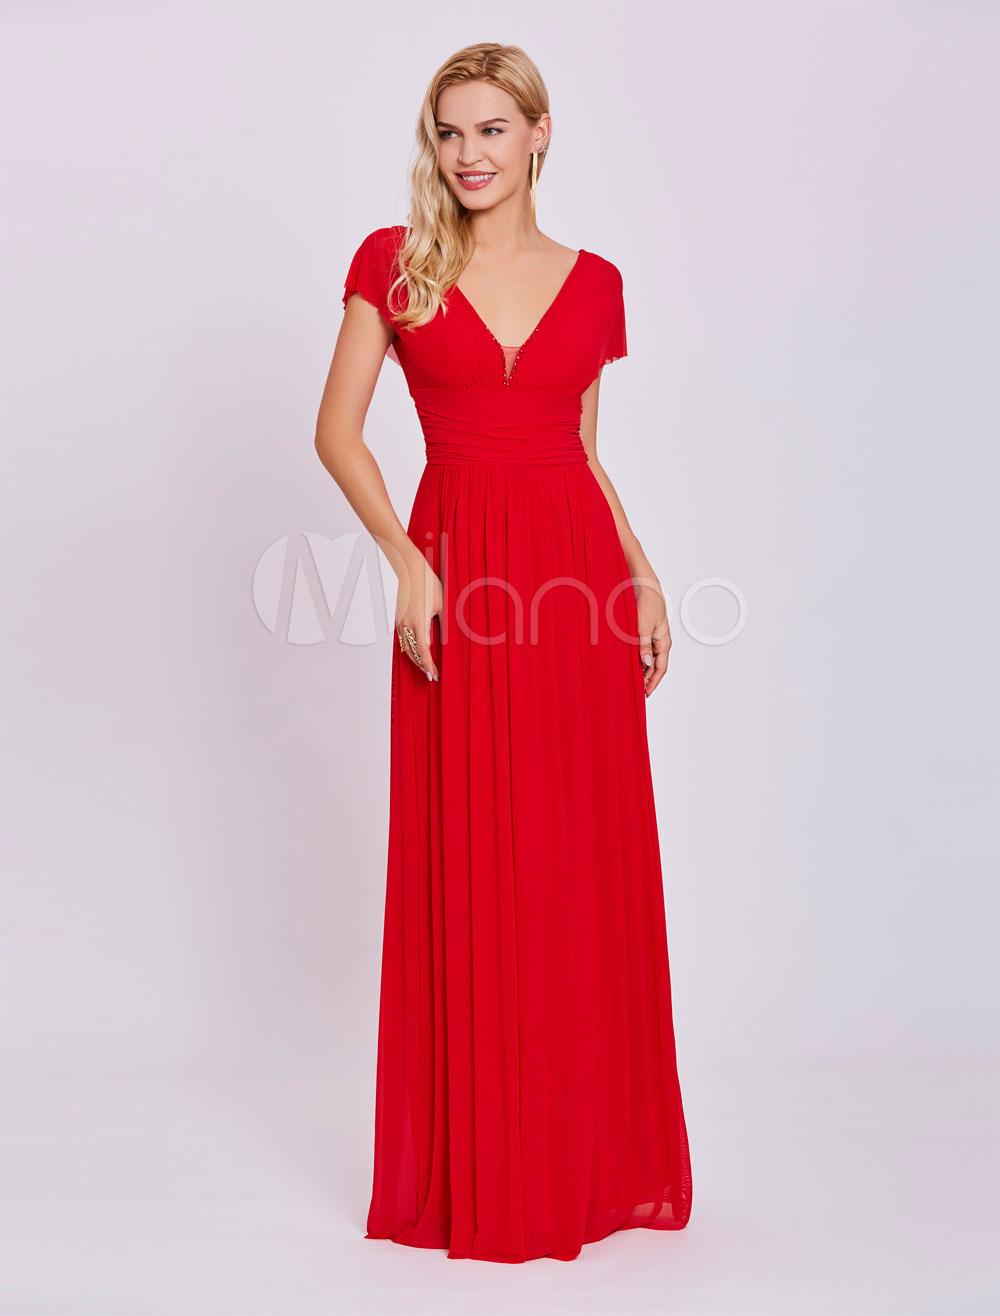 Red Prom Dresses 2018 Long Chiffon V Neck Evening Dress Short Sleeve Floor Length Formal Gowns (Wedding Cheap Party Dress) photo